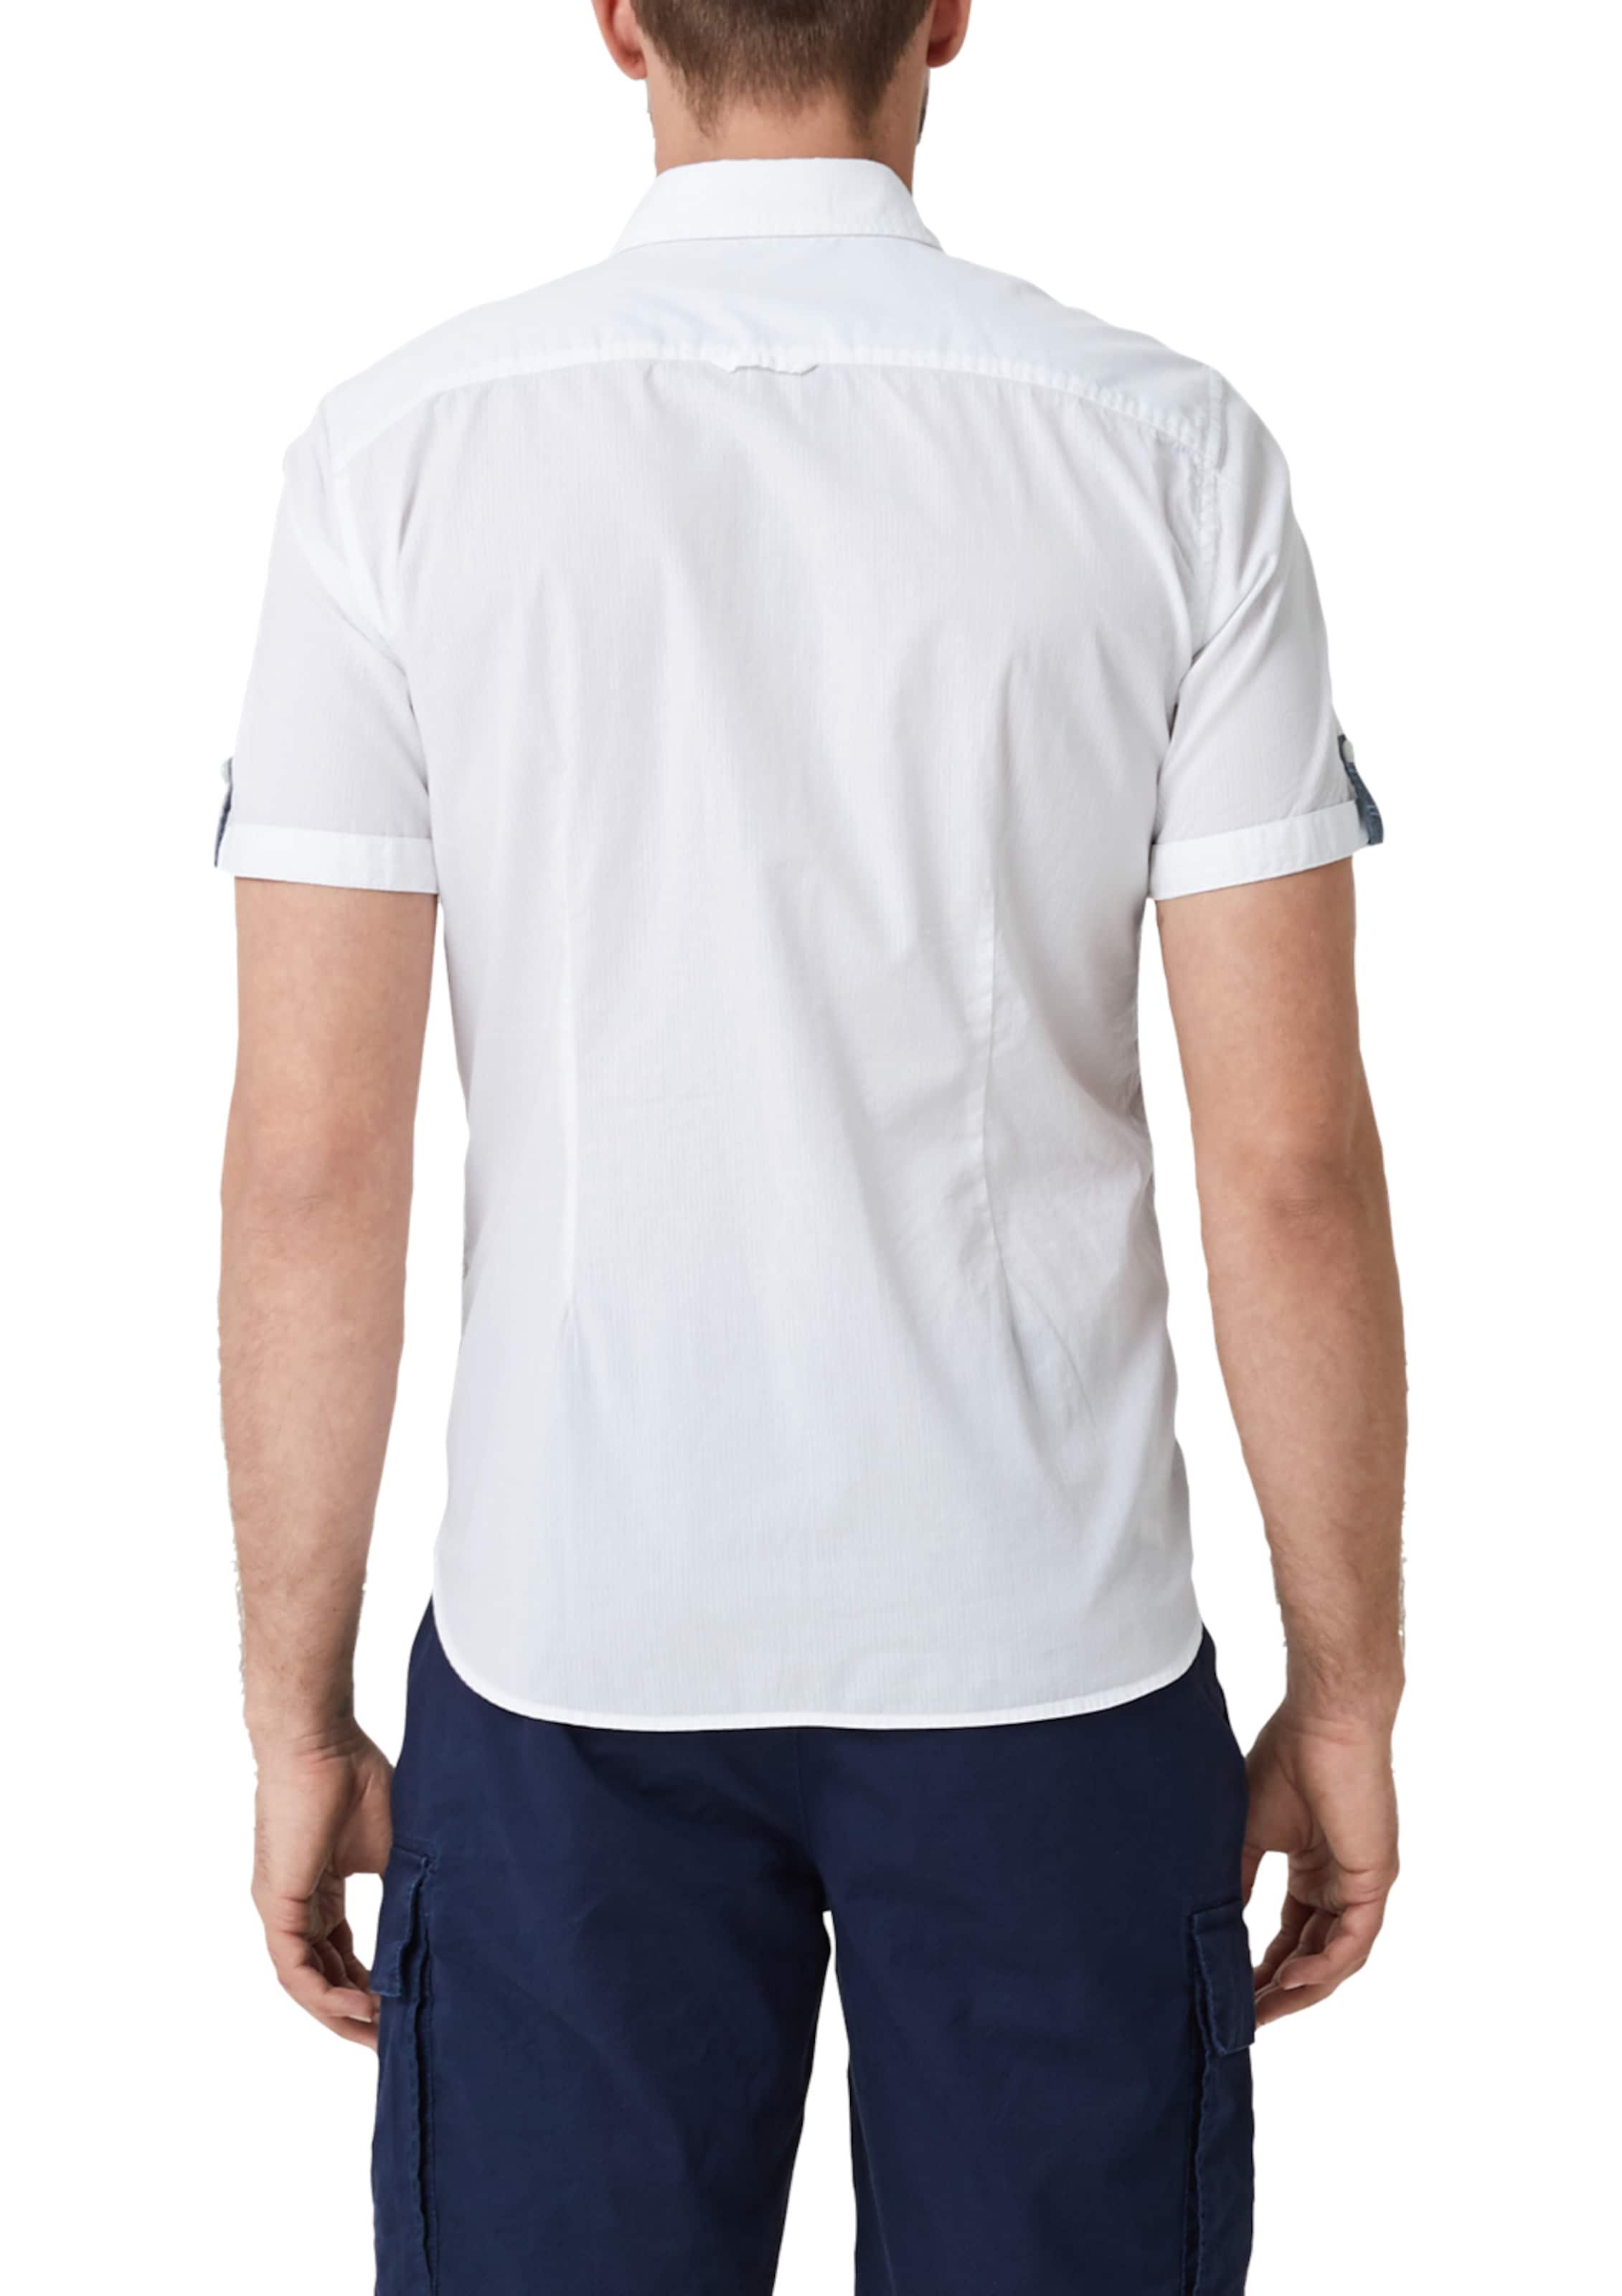 S Red Weiß Label Hemd In oliver NOny80vmw